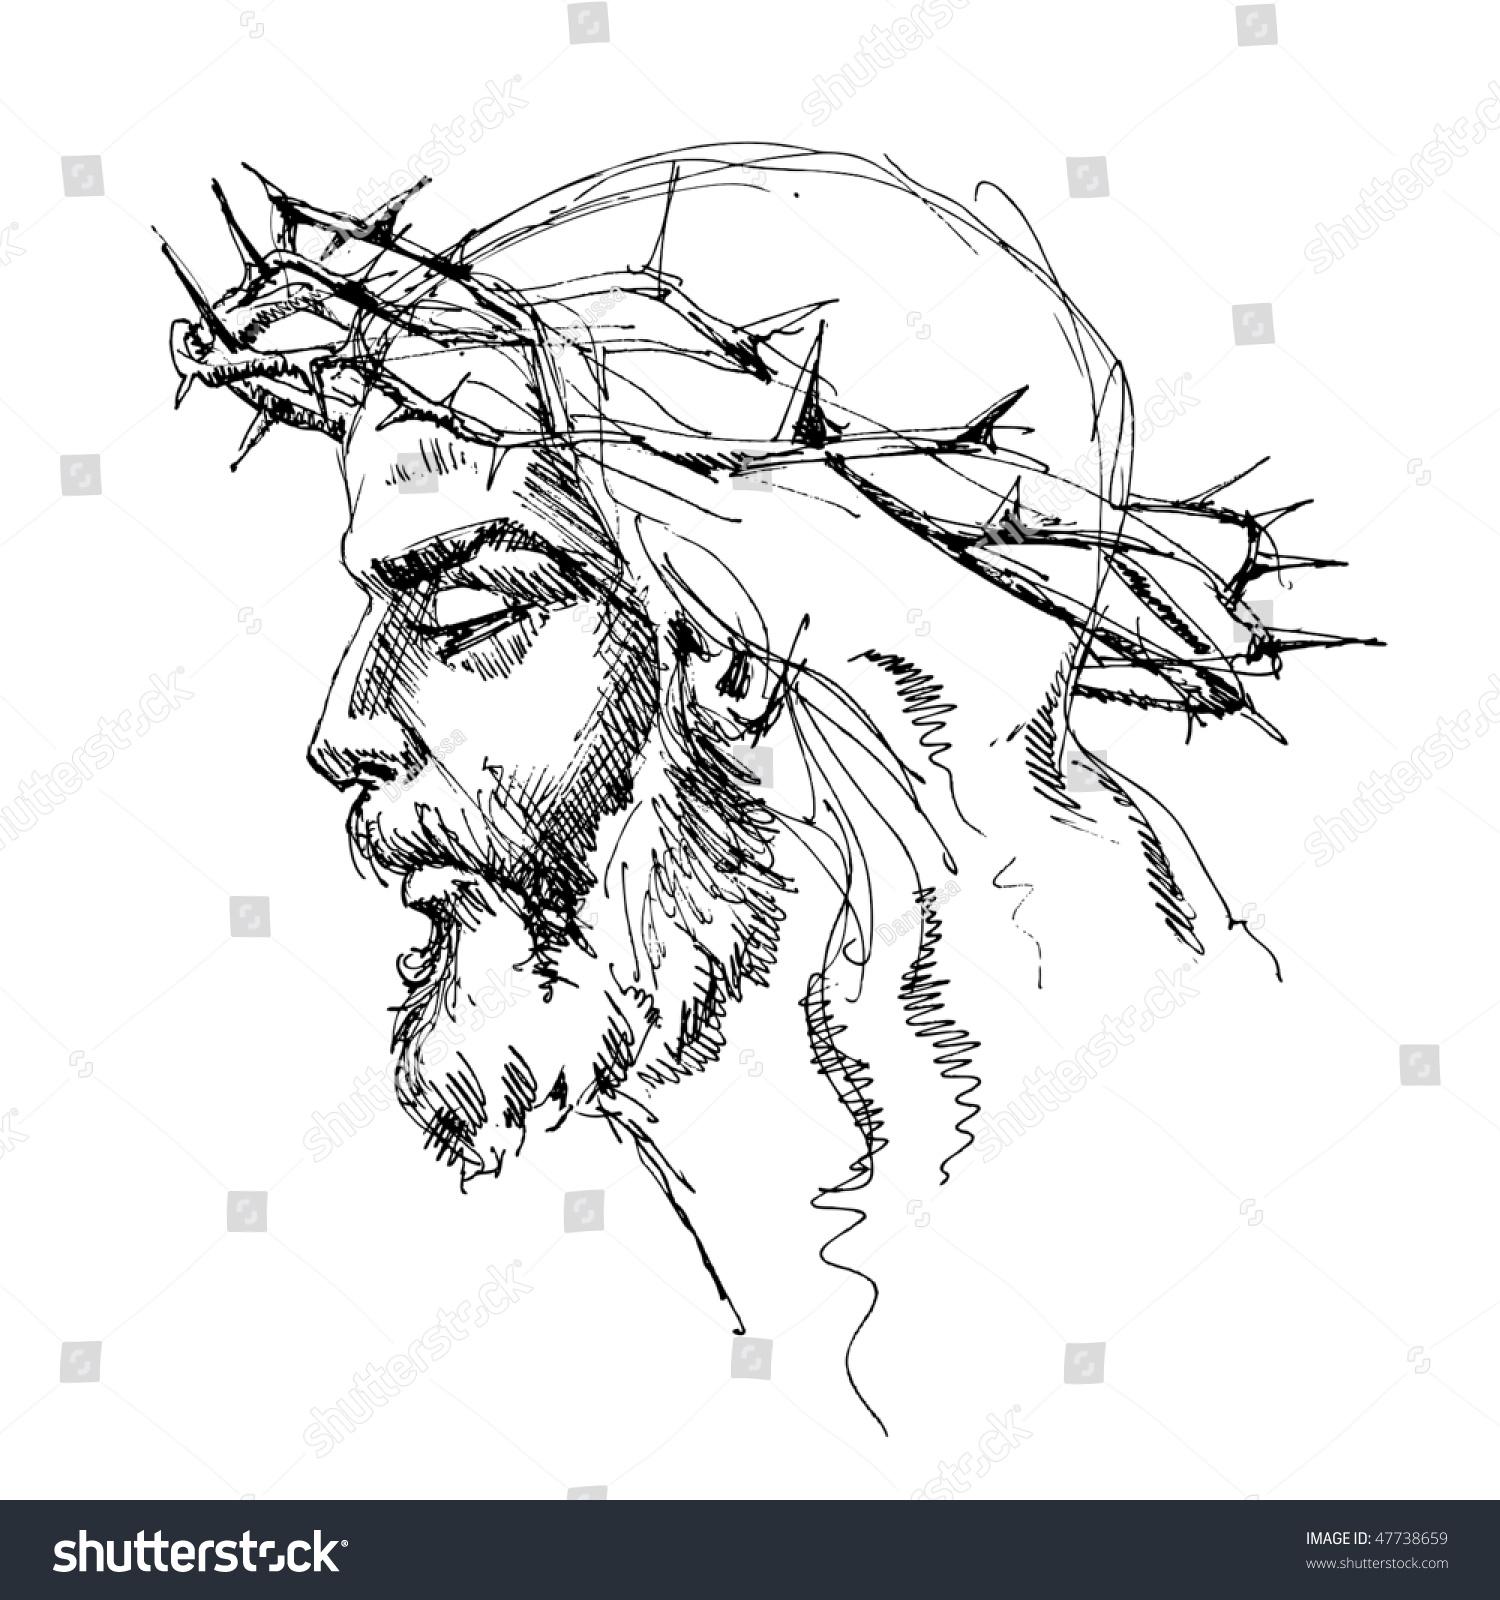 Jesus Christ Crown Thorns Stock Vector 47738659 - Shutterstock